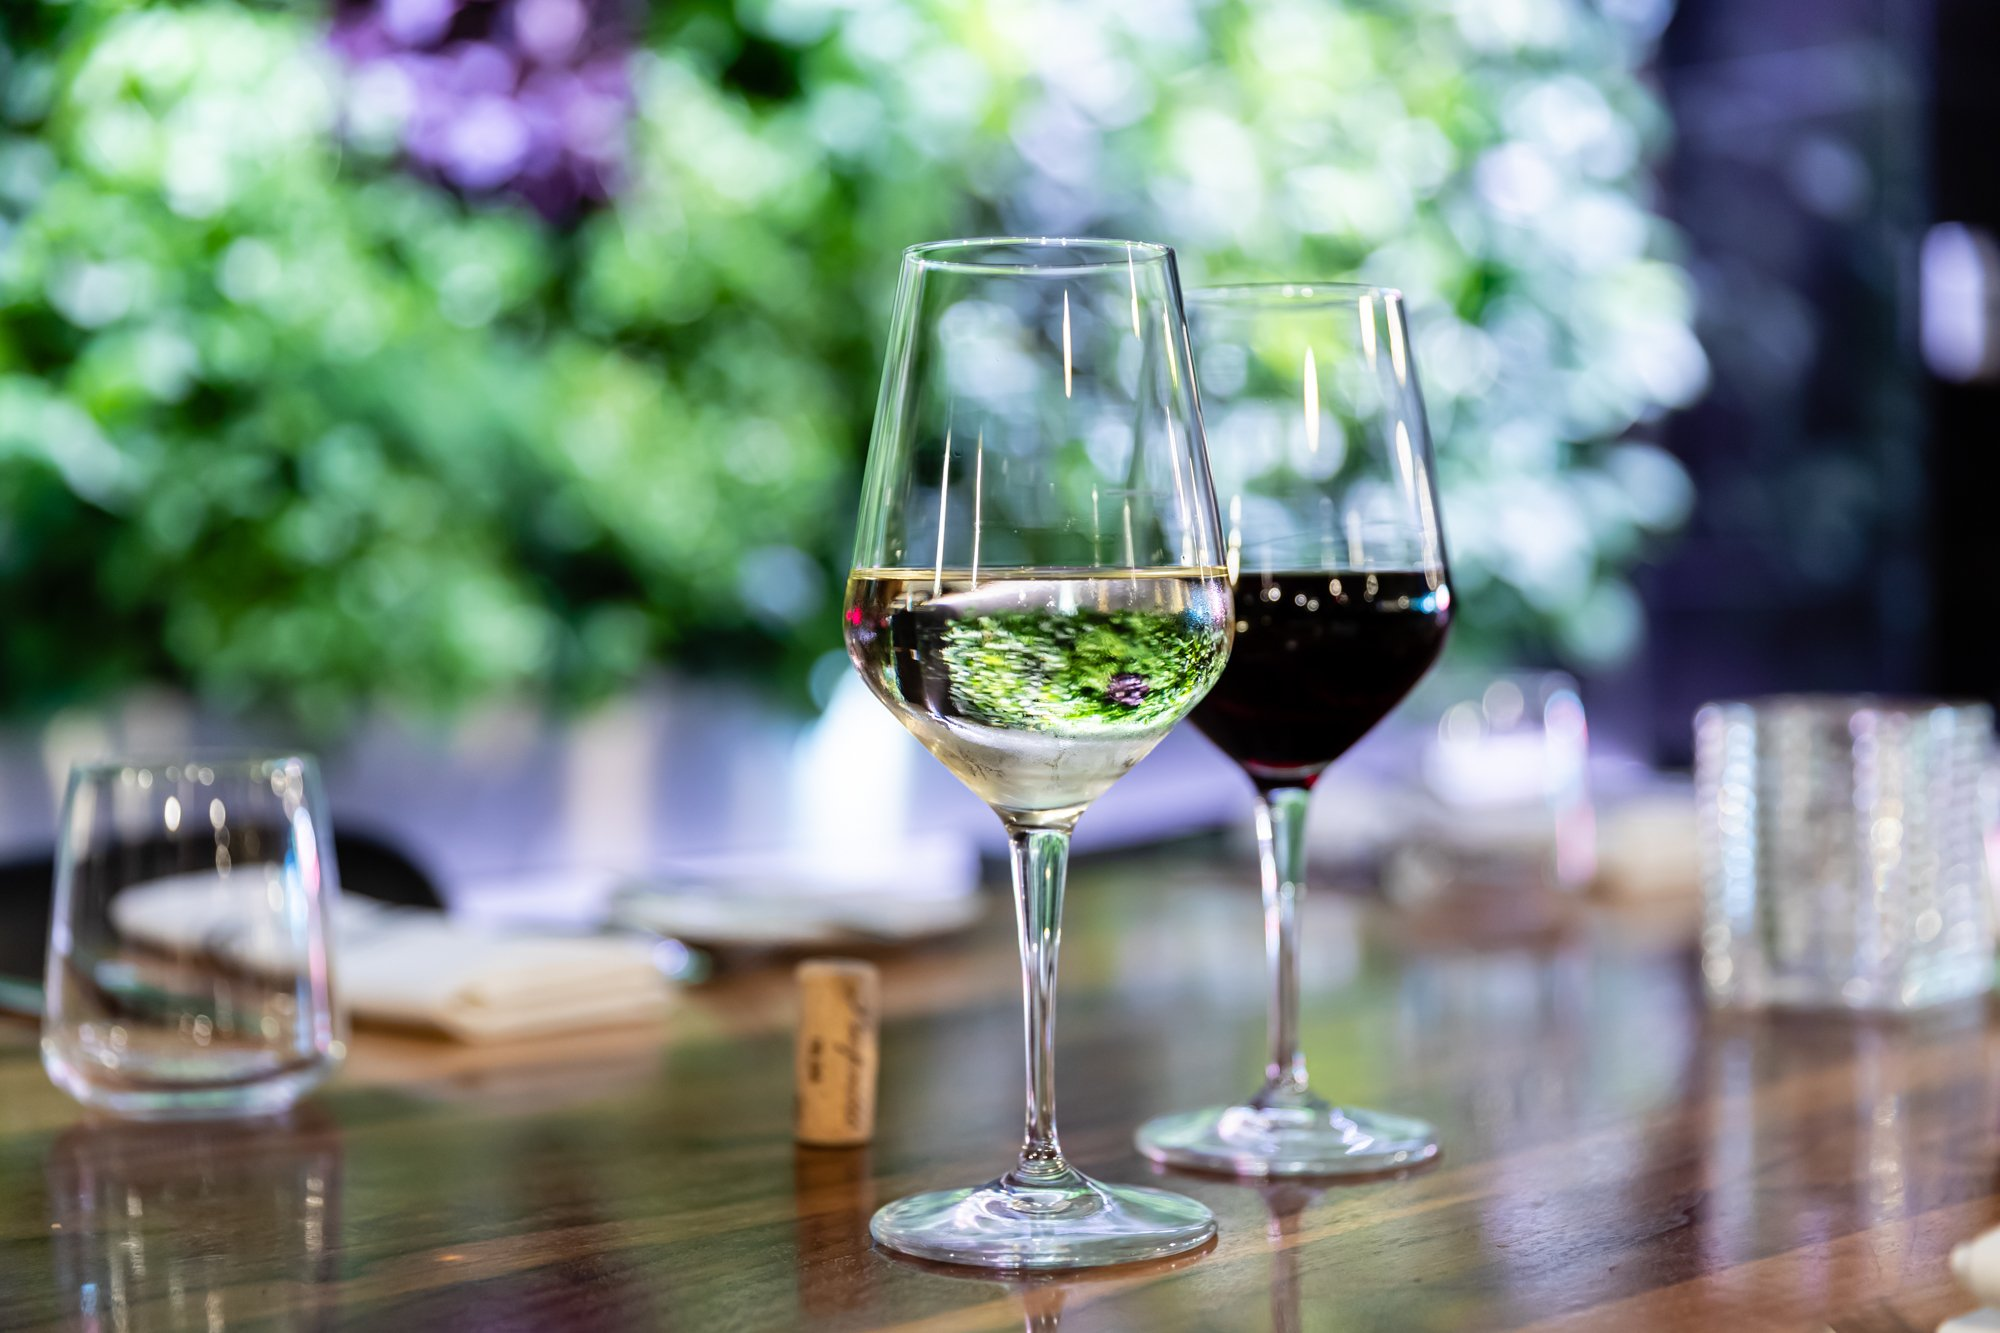 vino-16-08-2019-jfgalipeau-008